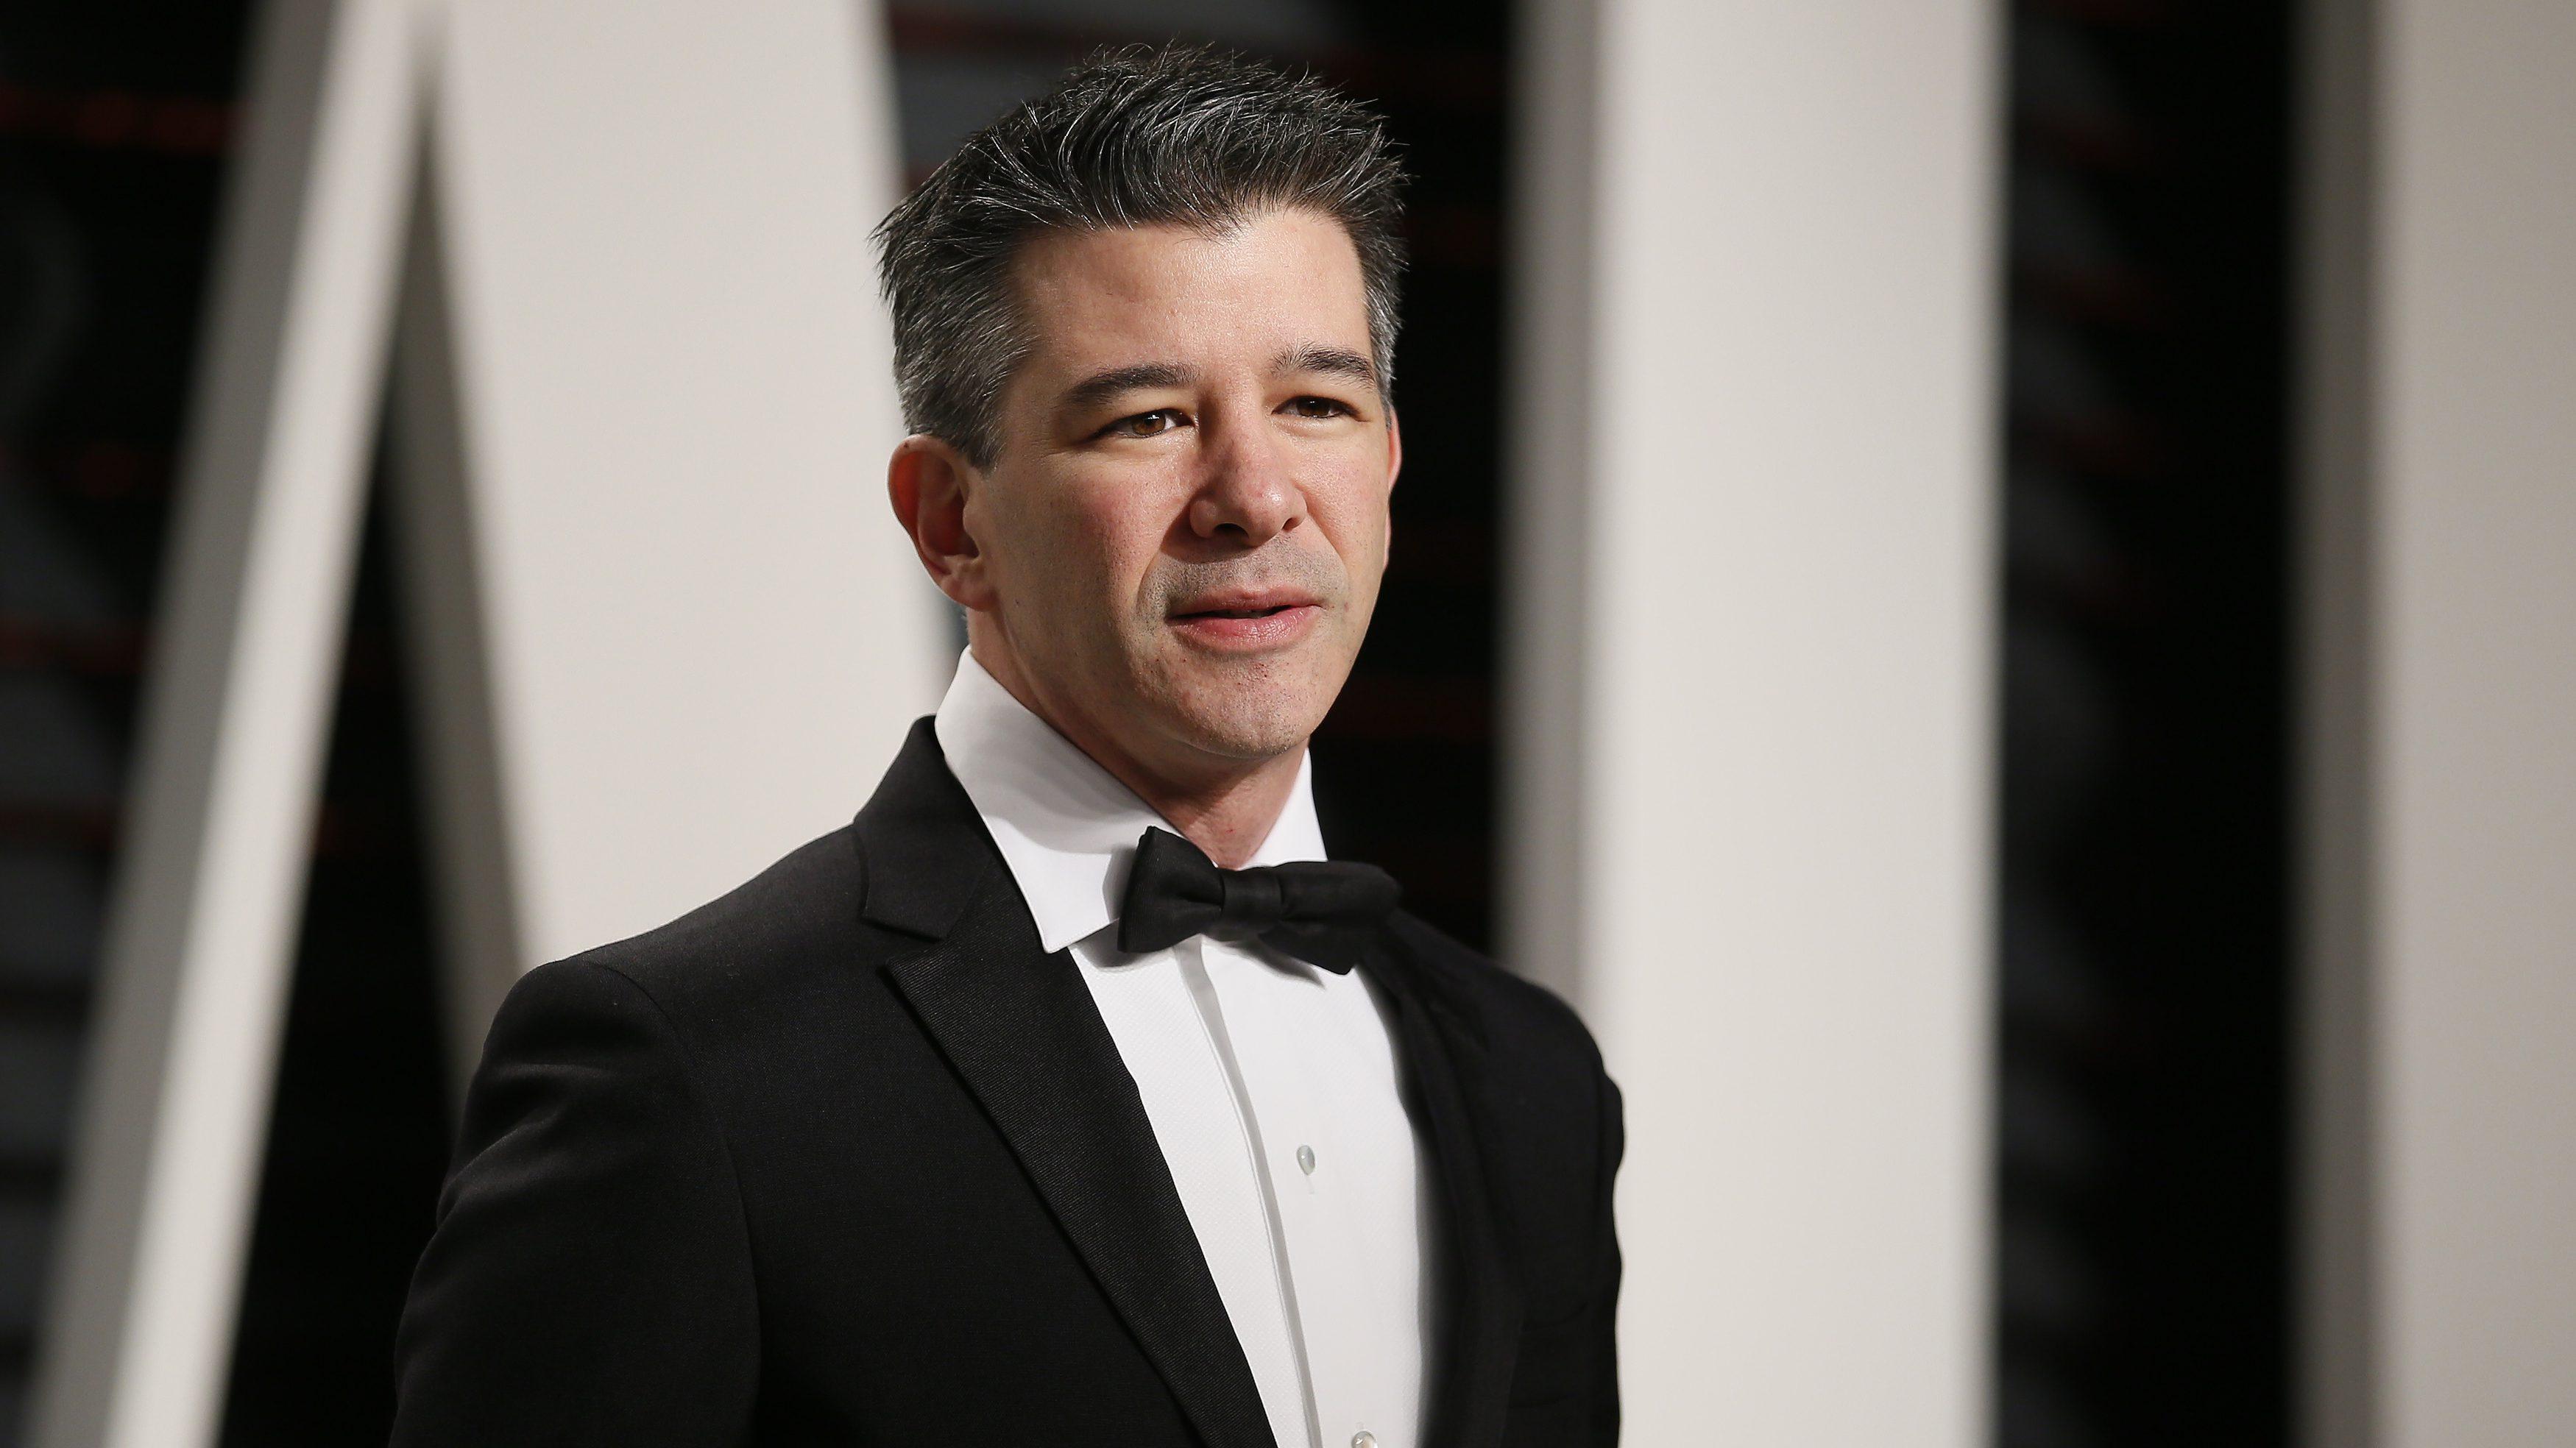 89th Academy Awards - Oscars Vanity Fair Party - Beverly Hills, California, U.S. - 26/02/17 – Uber co-founder Travis Kalanick. REUTERS/Danny Moloshok - RTS10HMR